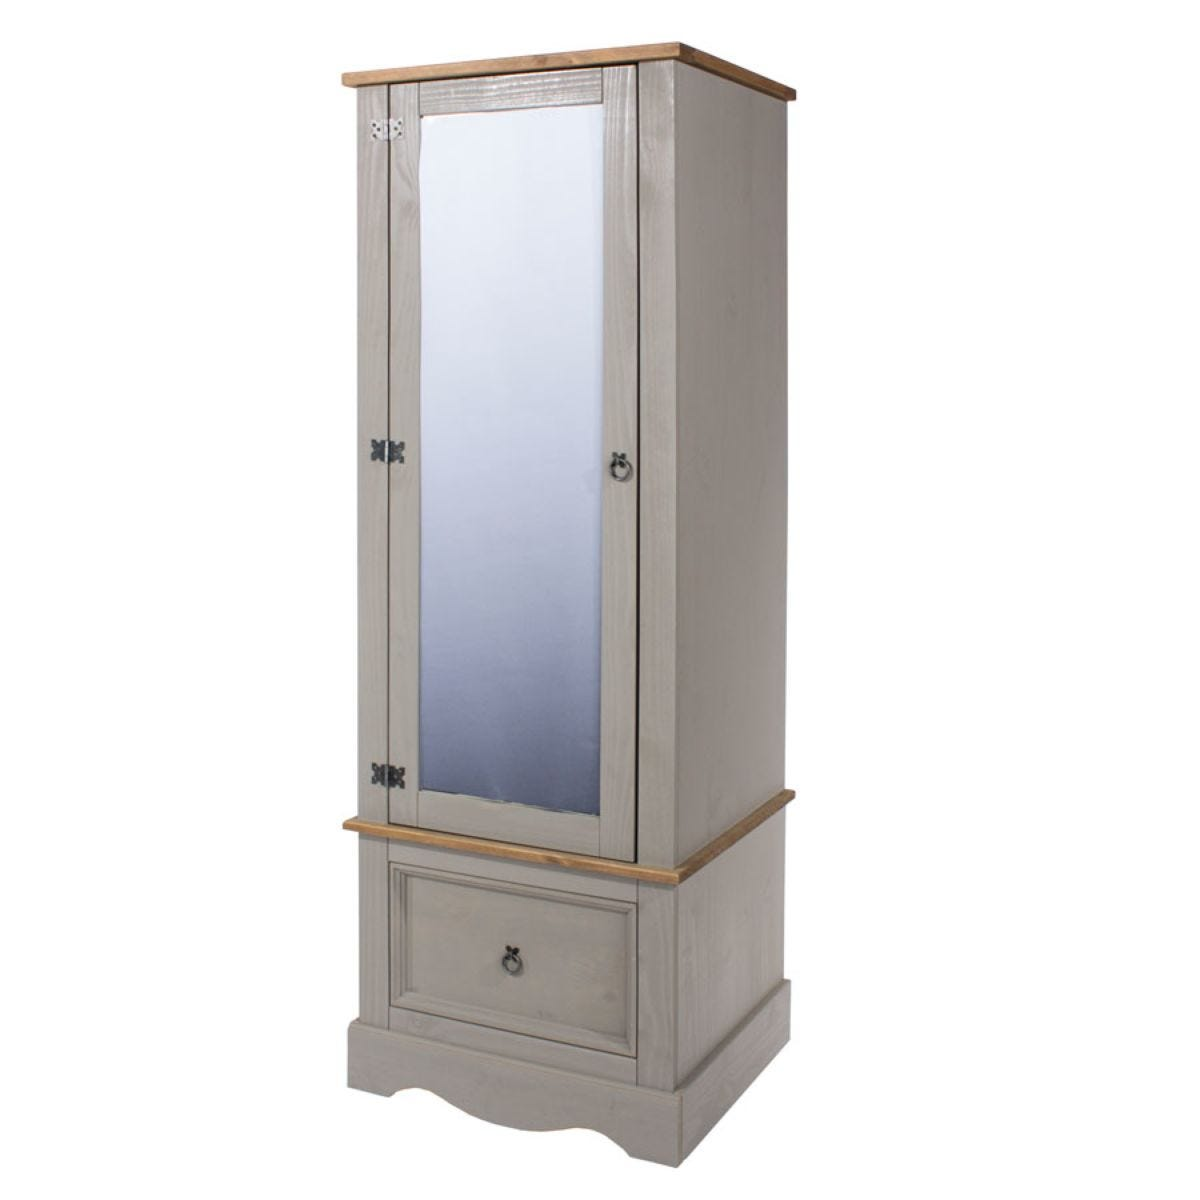 Halea Armoire with Mirror - Grey